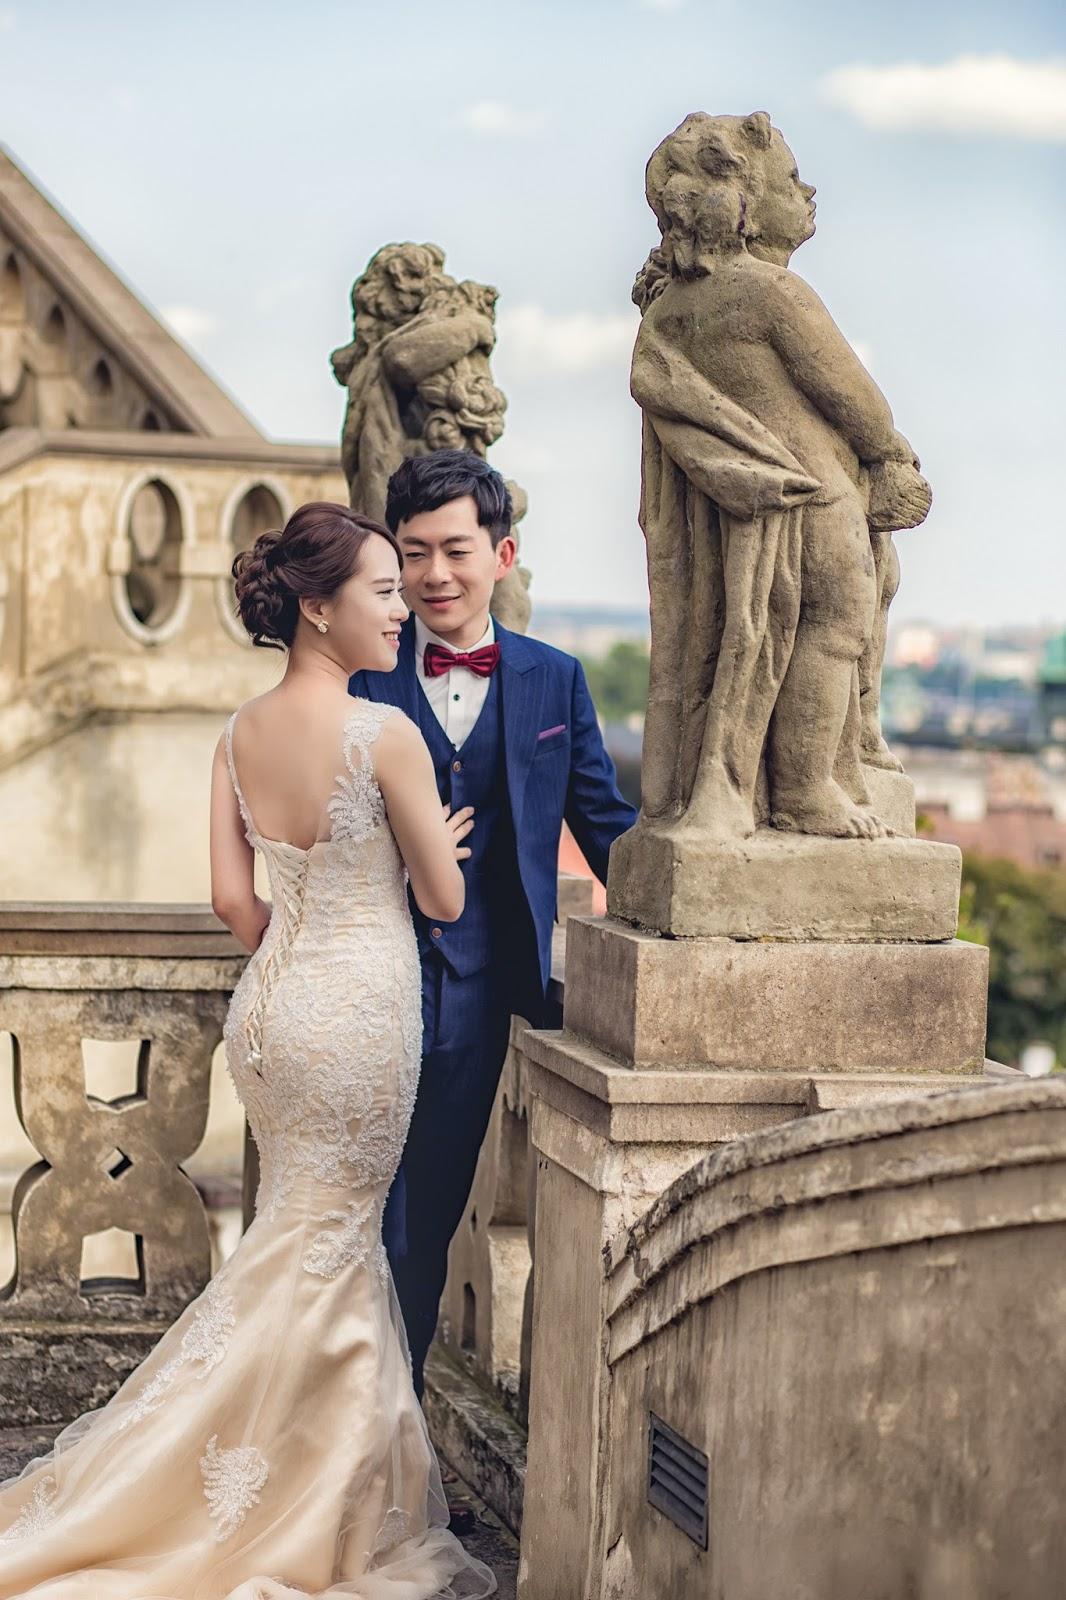 Pargue布拉格婚紗,海外婚紗,布拉格自助遊,布拉格蜜月,捷克婚紗,Hallstatt哈爾斯塔特婚紗,Vienna維也納婚紗,奧地利婚紗,ck小鎮,海外婚禮婚紗團隊